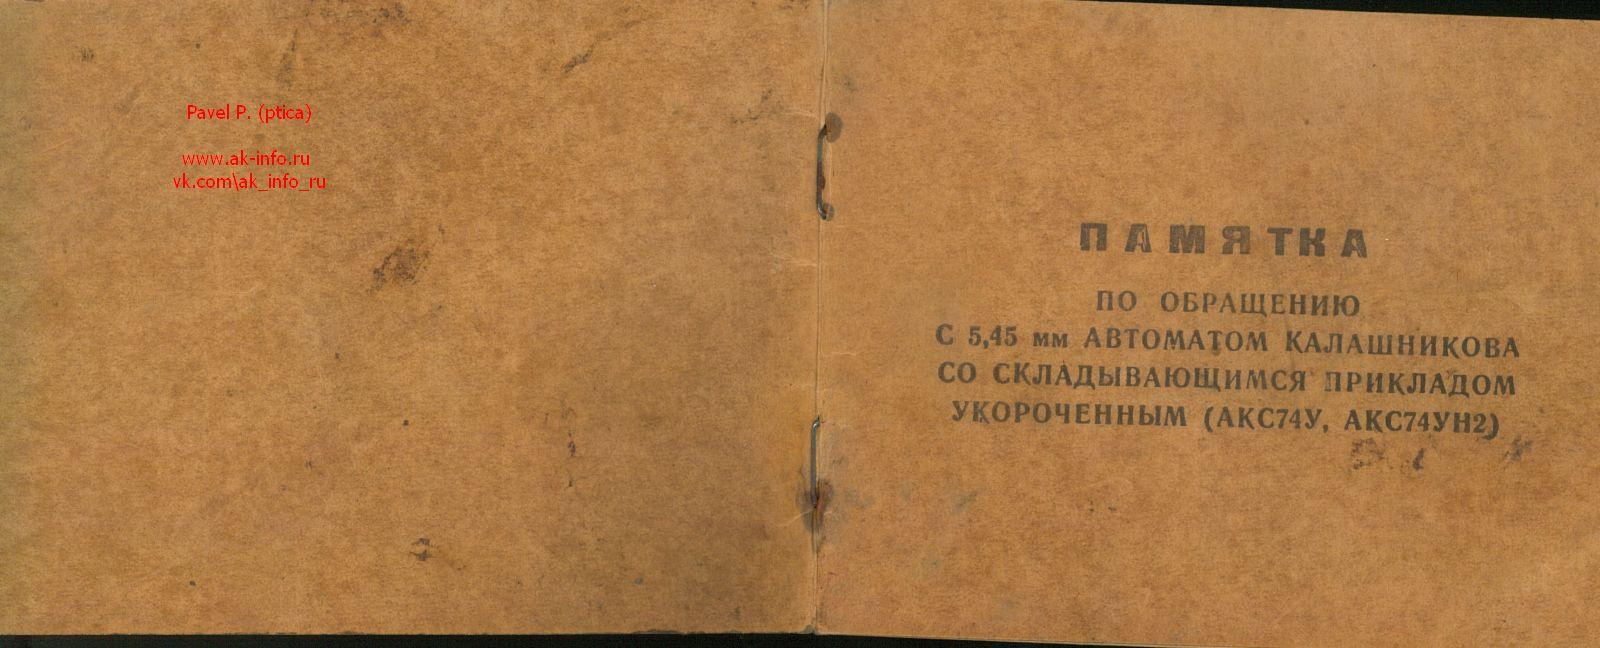 http://www.ak-info.ru/ak74/p_aks74u_87/aksu01.jpg